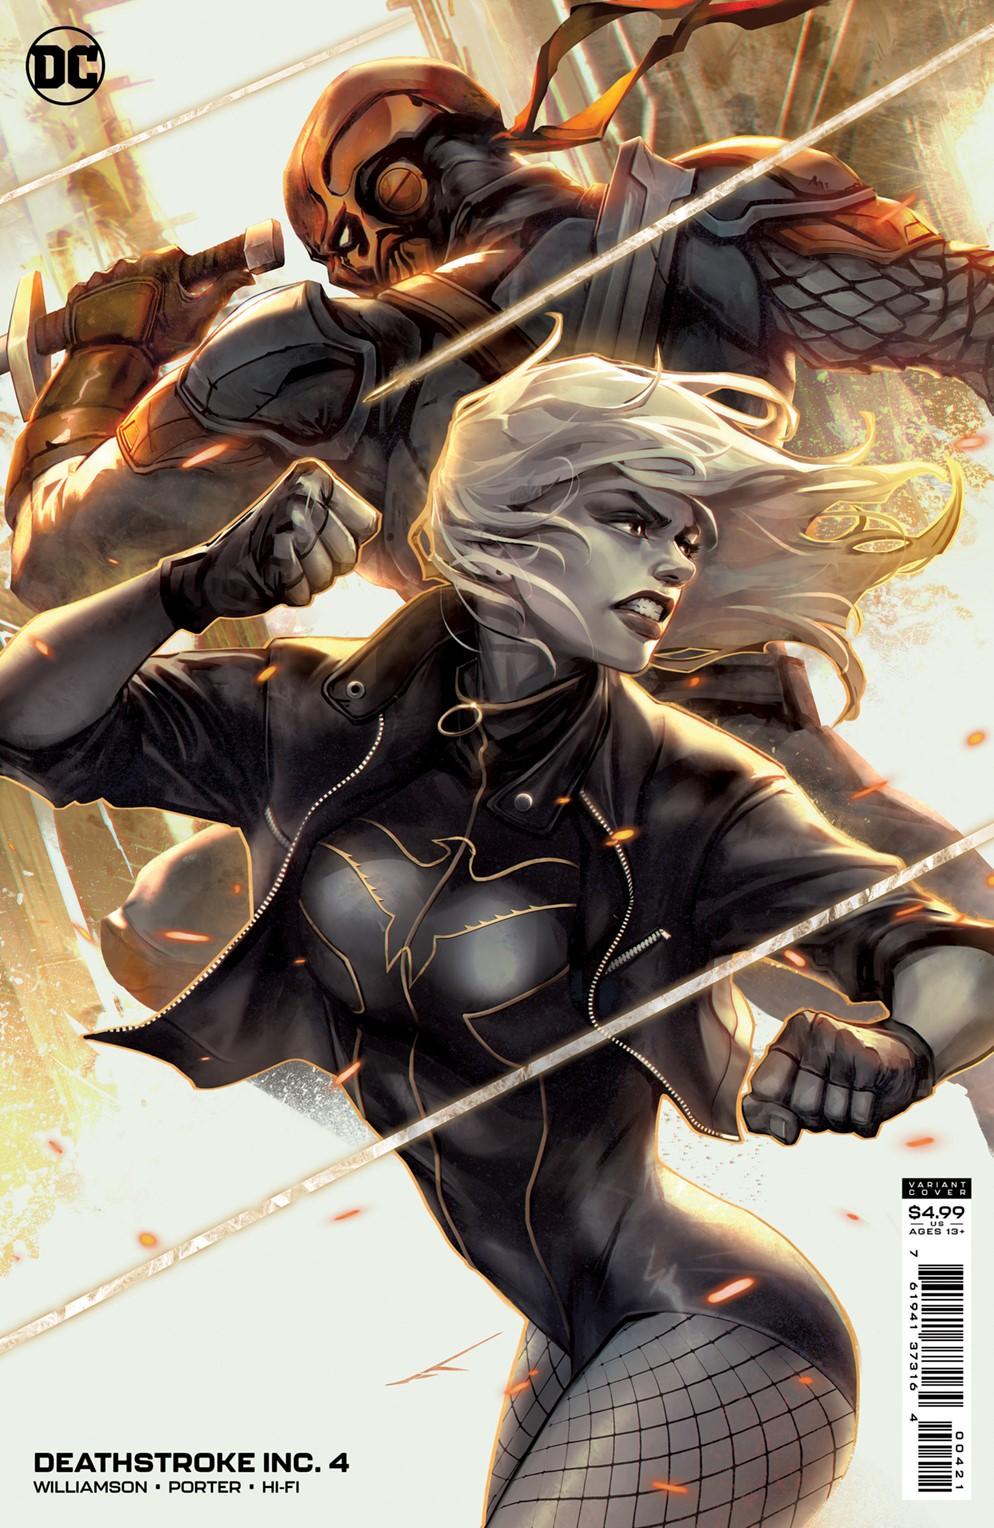 DSKINC_Cv4_var DC Comics December 2021 Solicitations